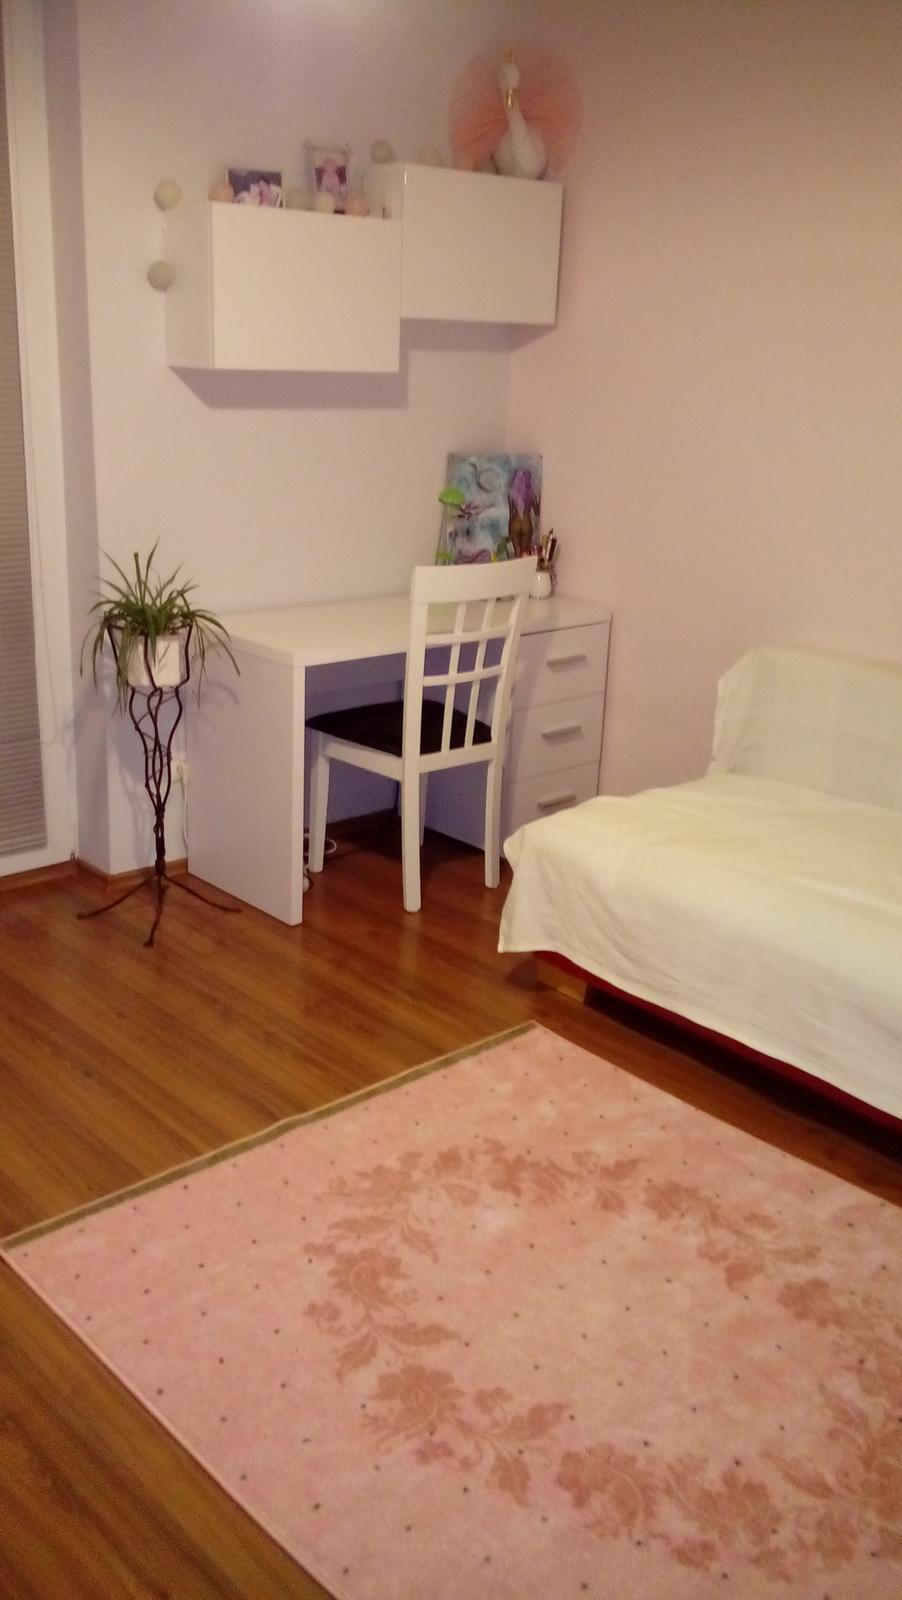 Projekt hostovska  nakoniec detska :-D - pohlad od dveri doprava .. novy koberec a otocena pohovka o 90st